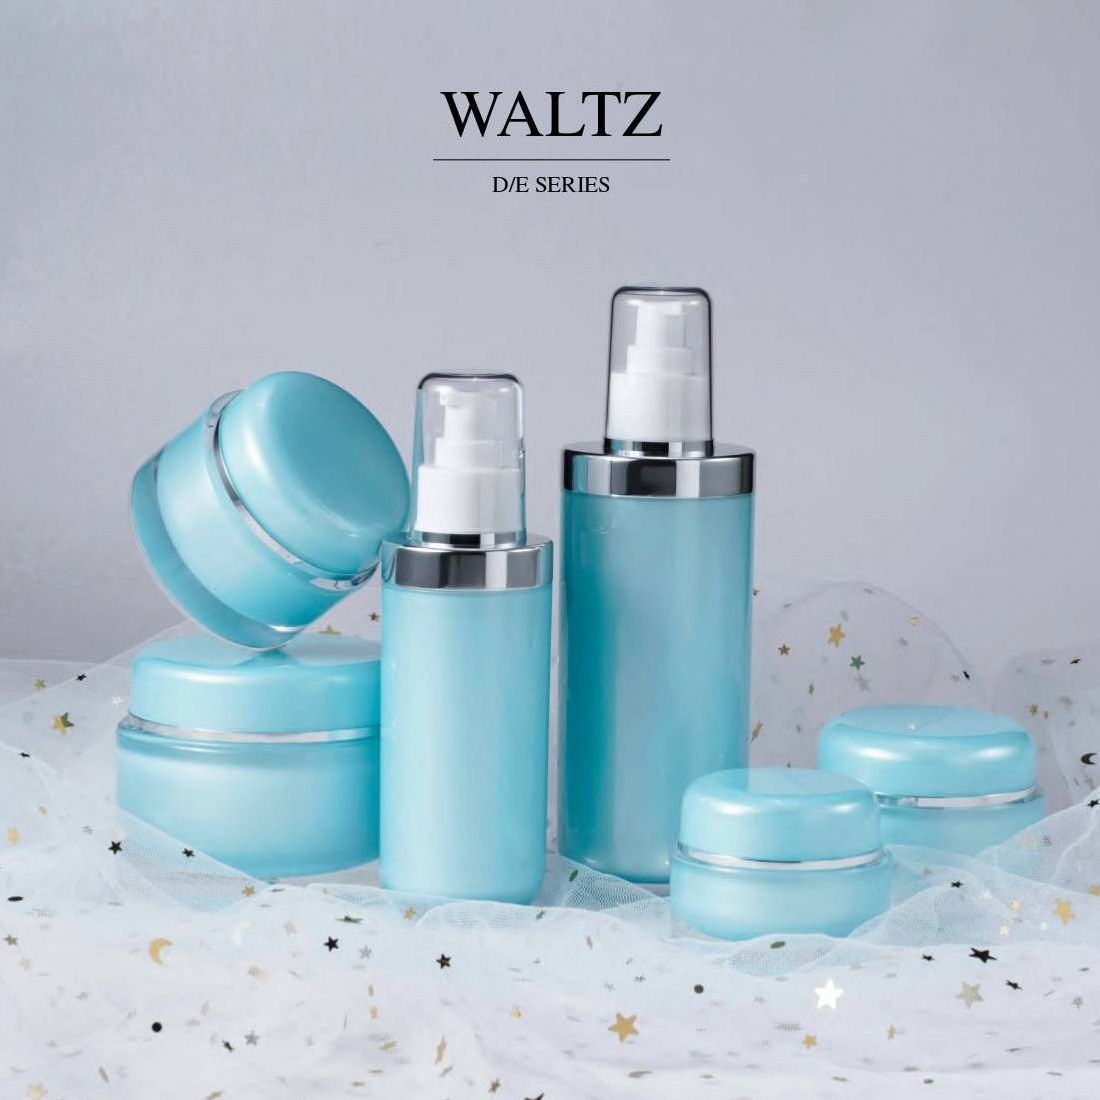 COSJAR design de containere comet - seria Waltz